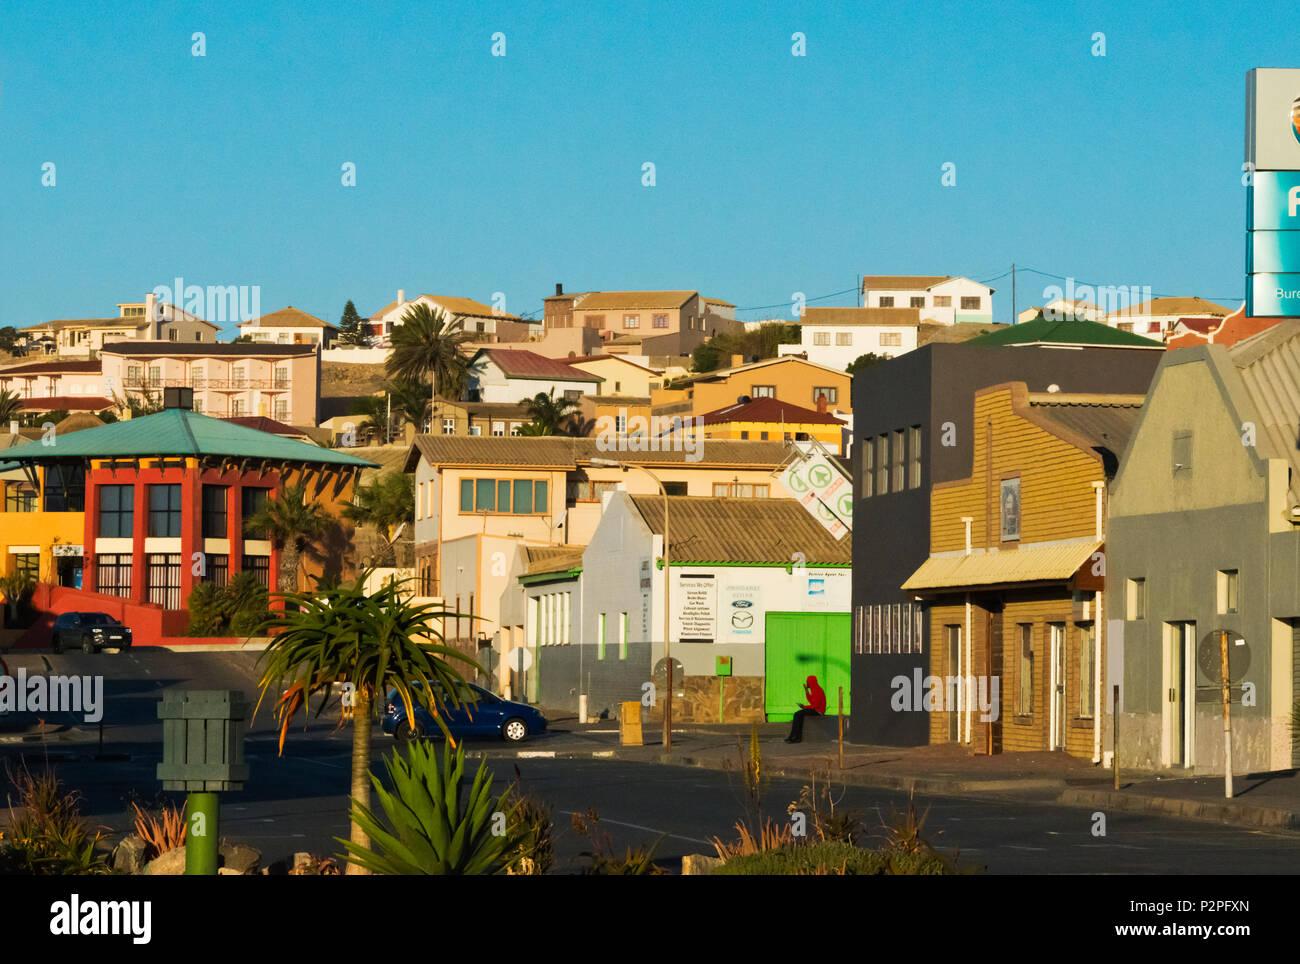 Colonial house, Luderitz, Karas Region, Namibia - Stock Image